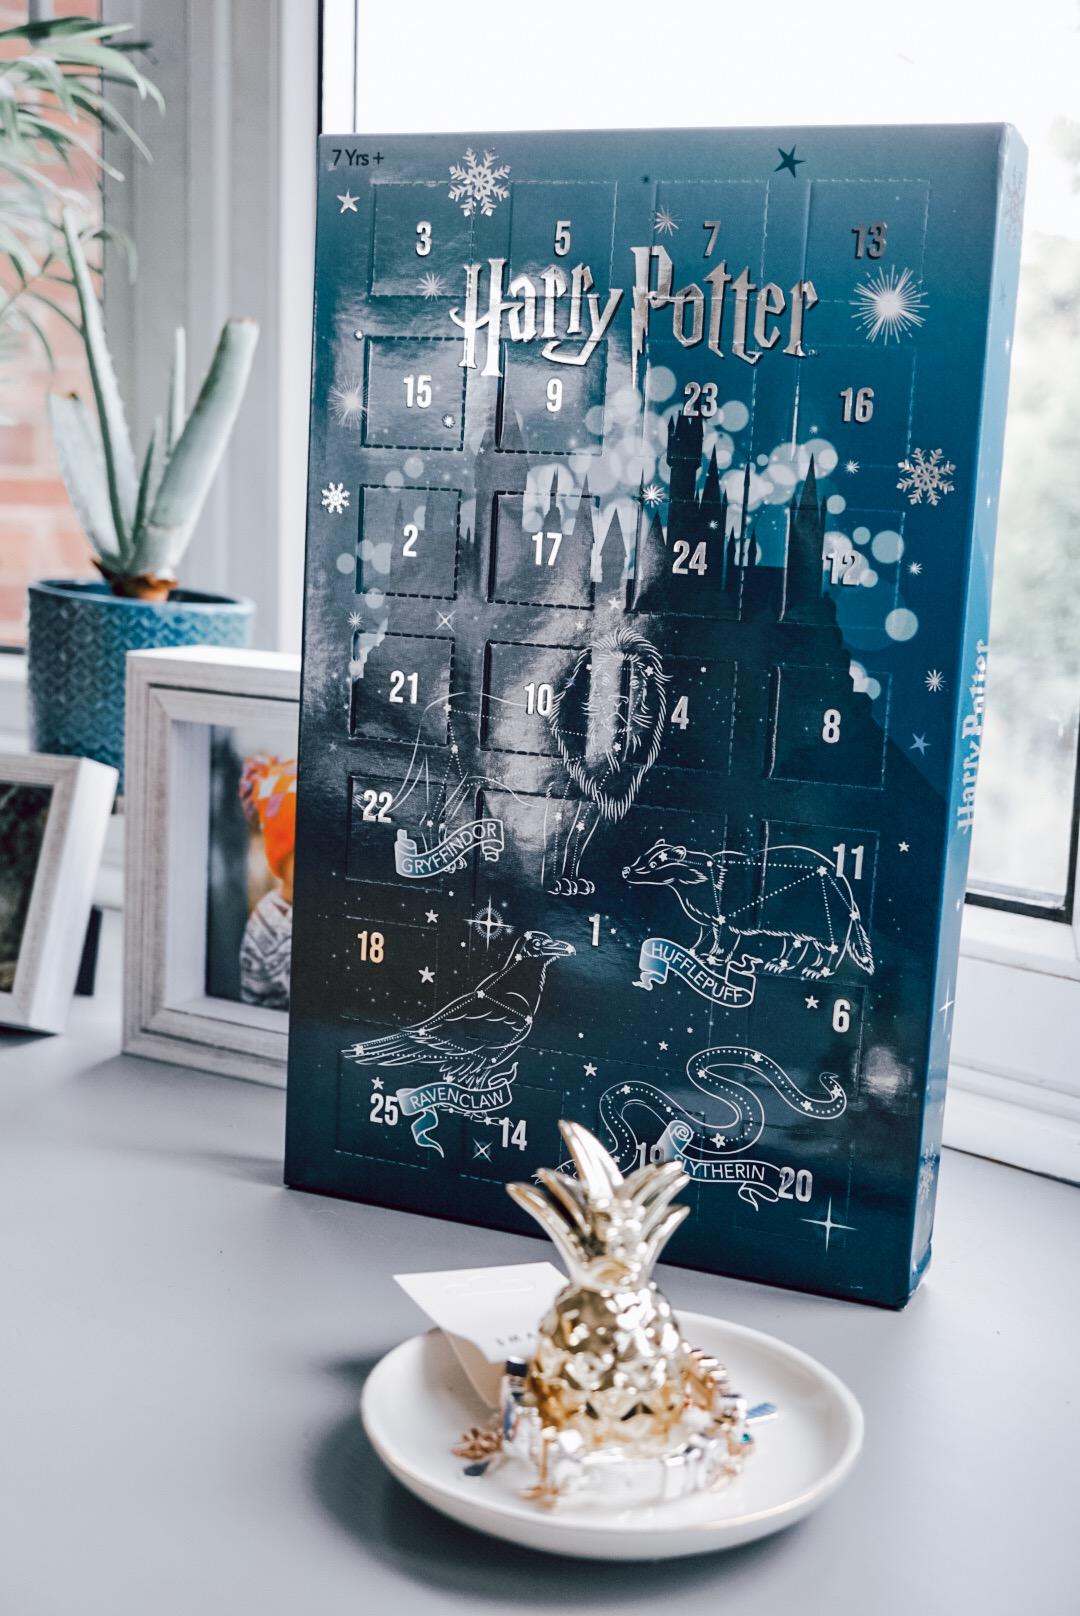 A Harry Potter Advent Calendar 2019